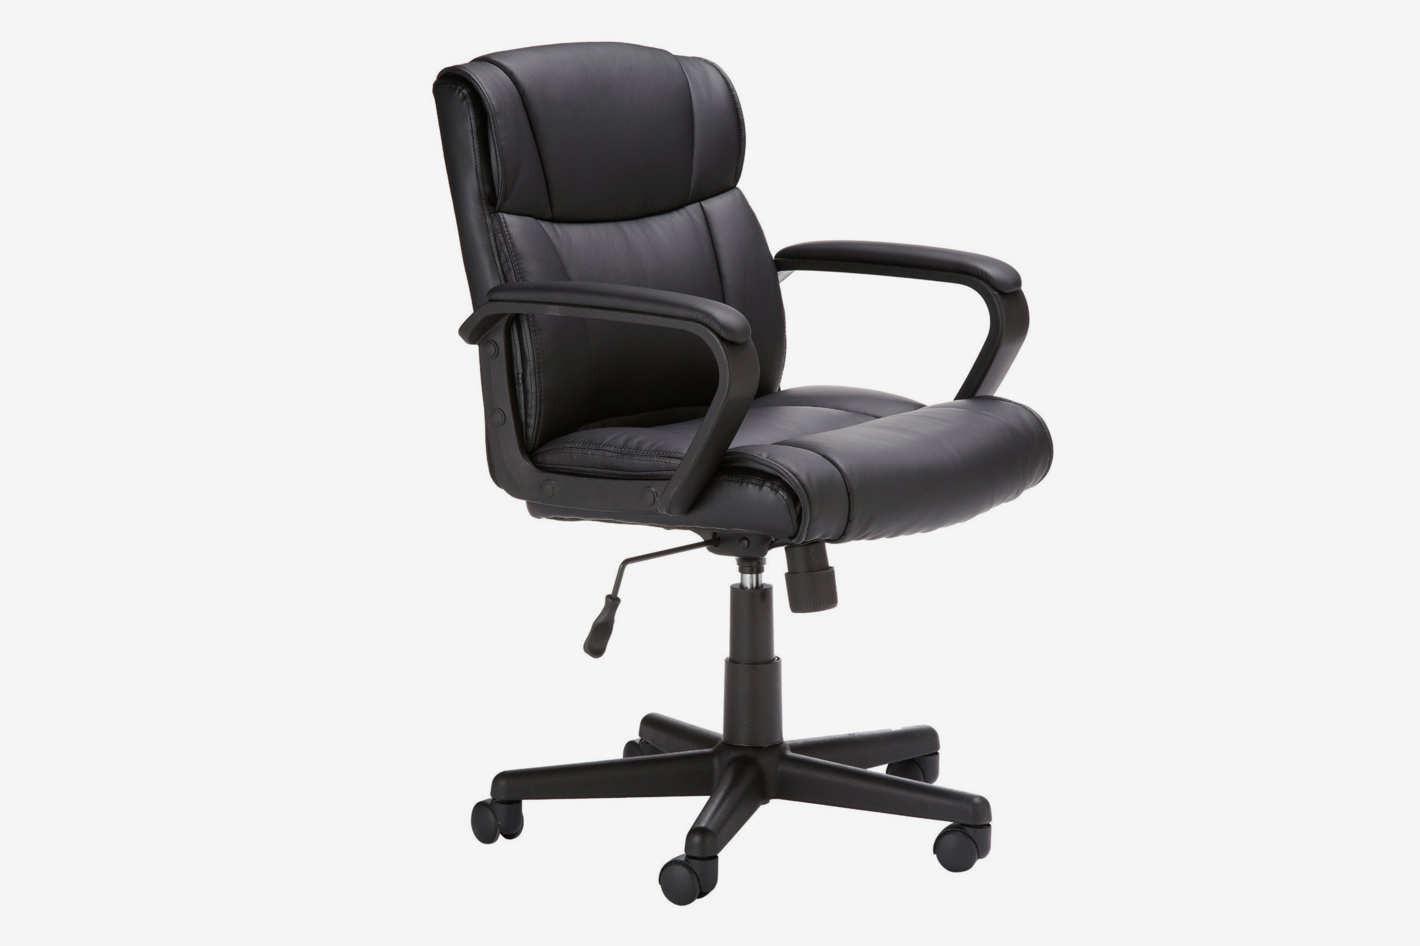 Best ideas about Best Office Chair Under 100 . Save or Pin 15 Best fice Chairs and Home fice Chairs 2019 Now.